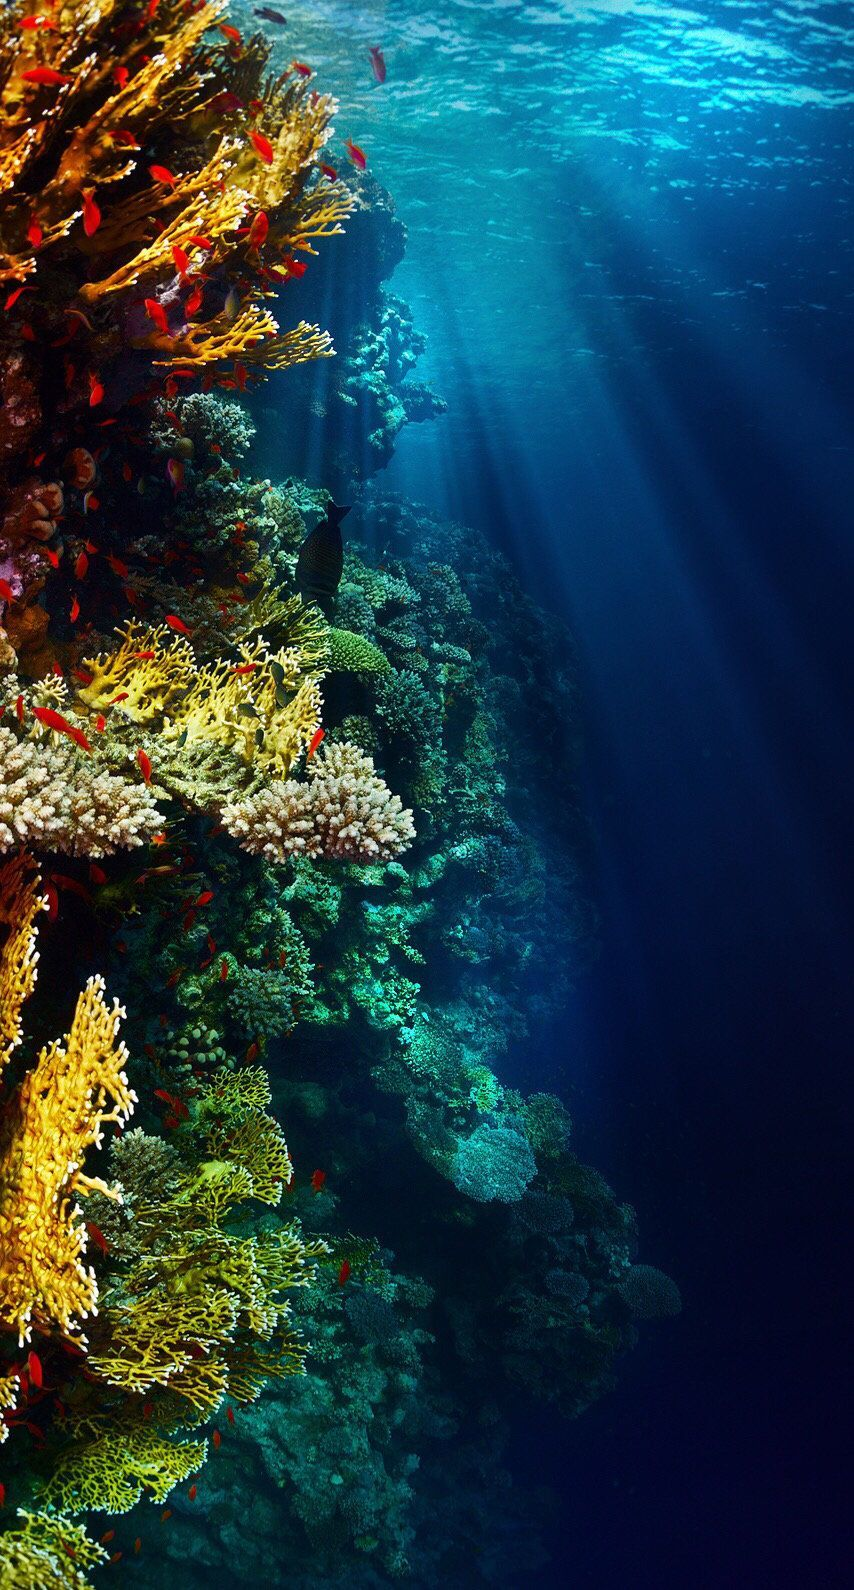 Iphone 11 Wallpaper Landscape Ocean Sea Underwater Wallpaper Background Wallpap Iphone 11 Wallp In 2020 Underwater Wallpaper Iphone Wallpaper Ocean Wallpaper Wa